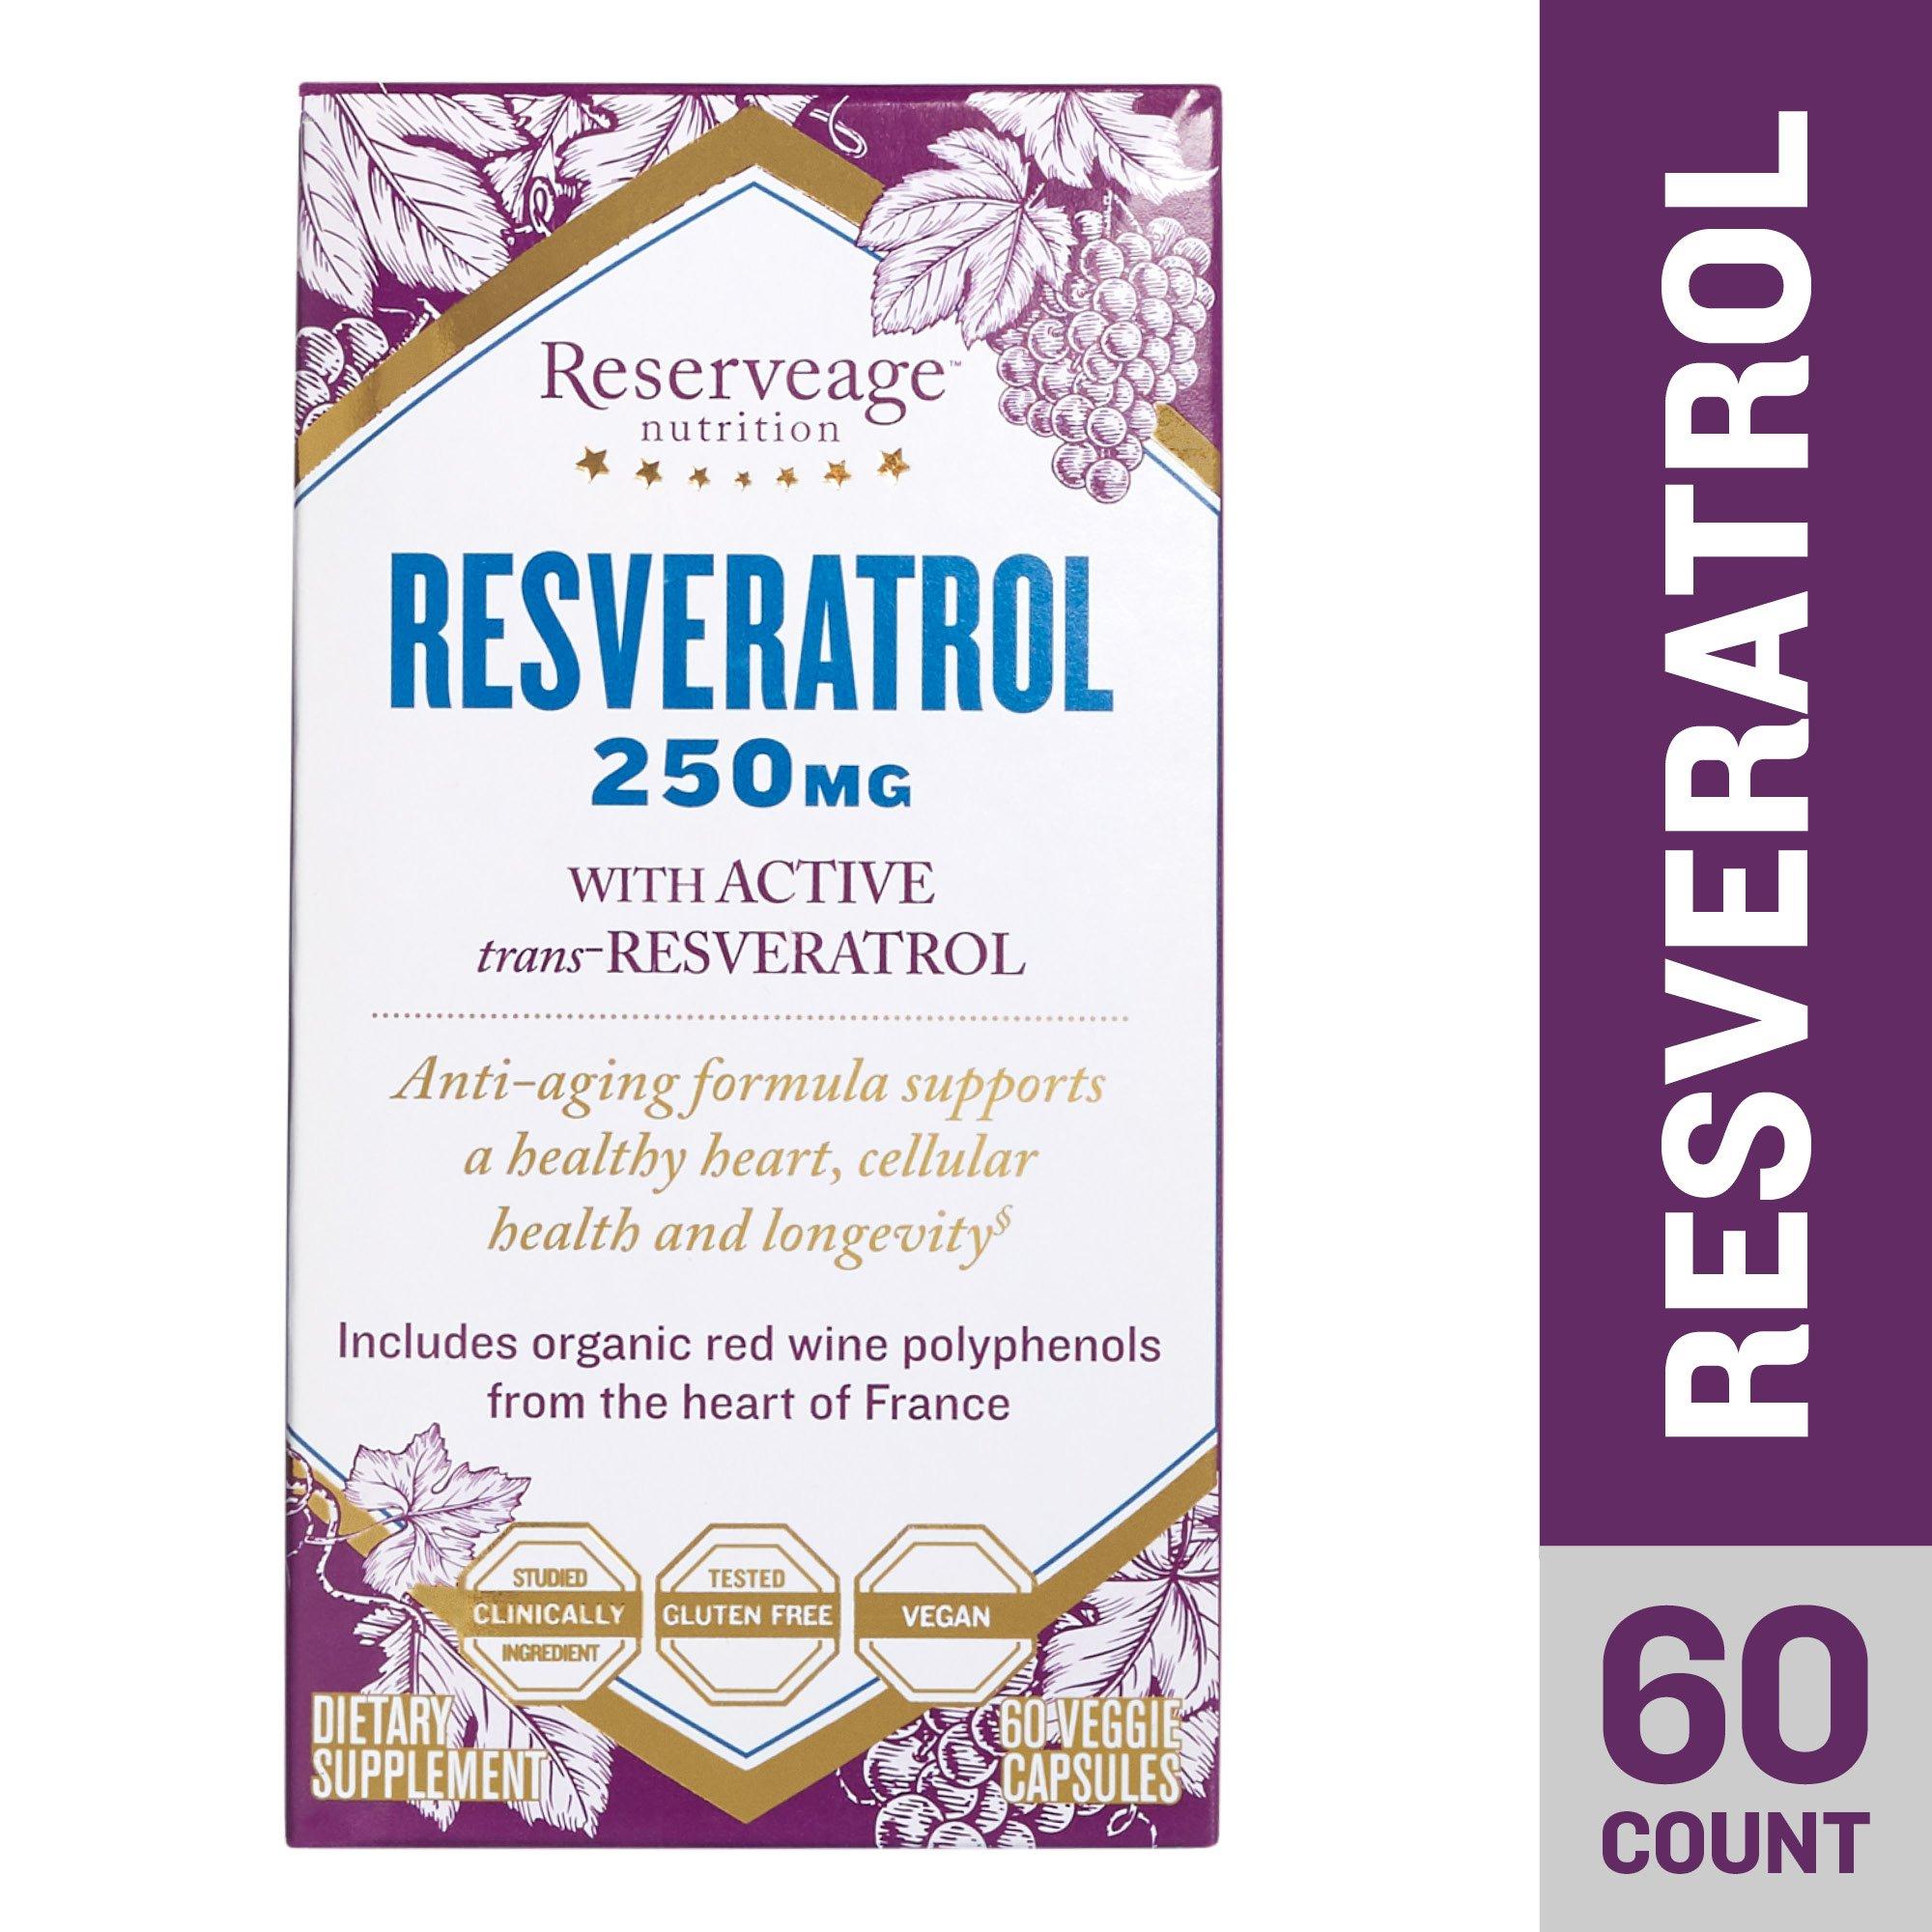 Reserveage - Resveratrol 250mg